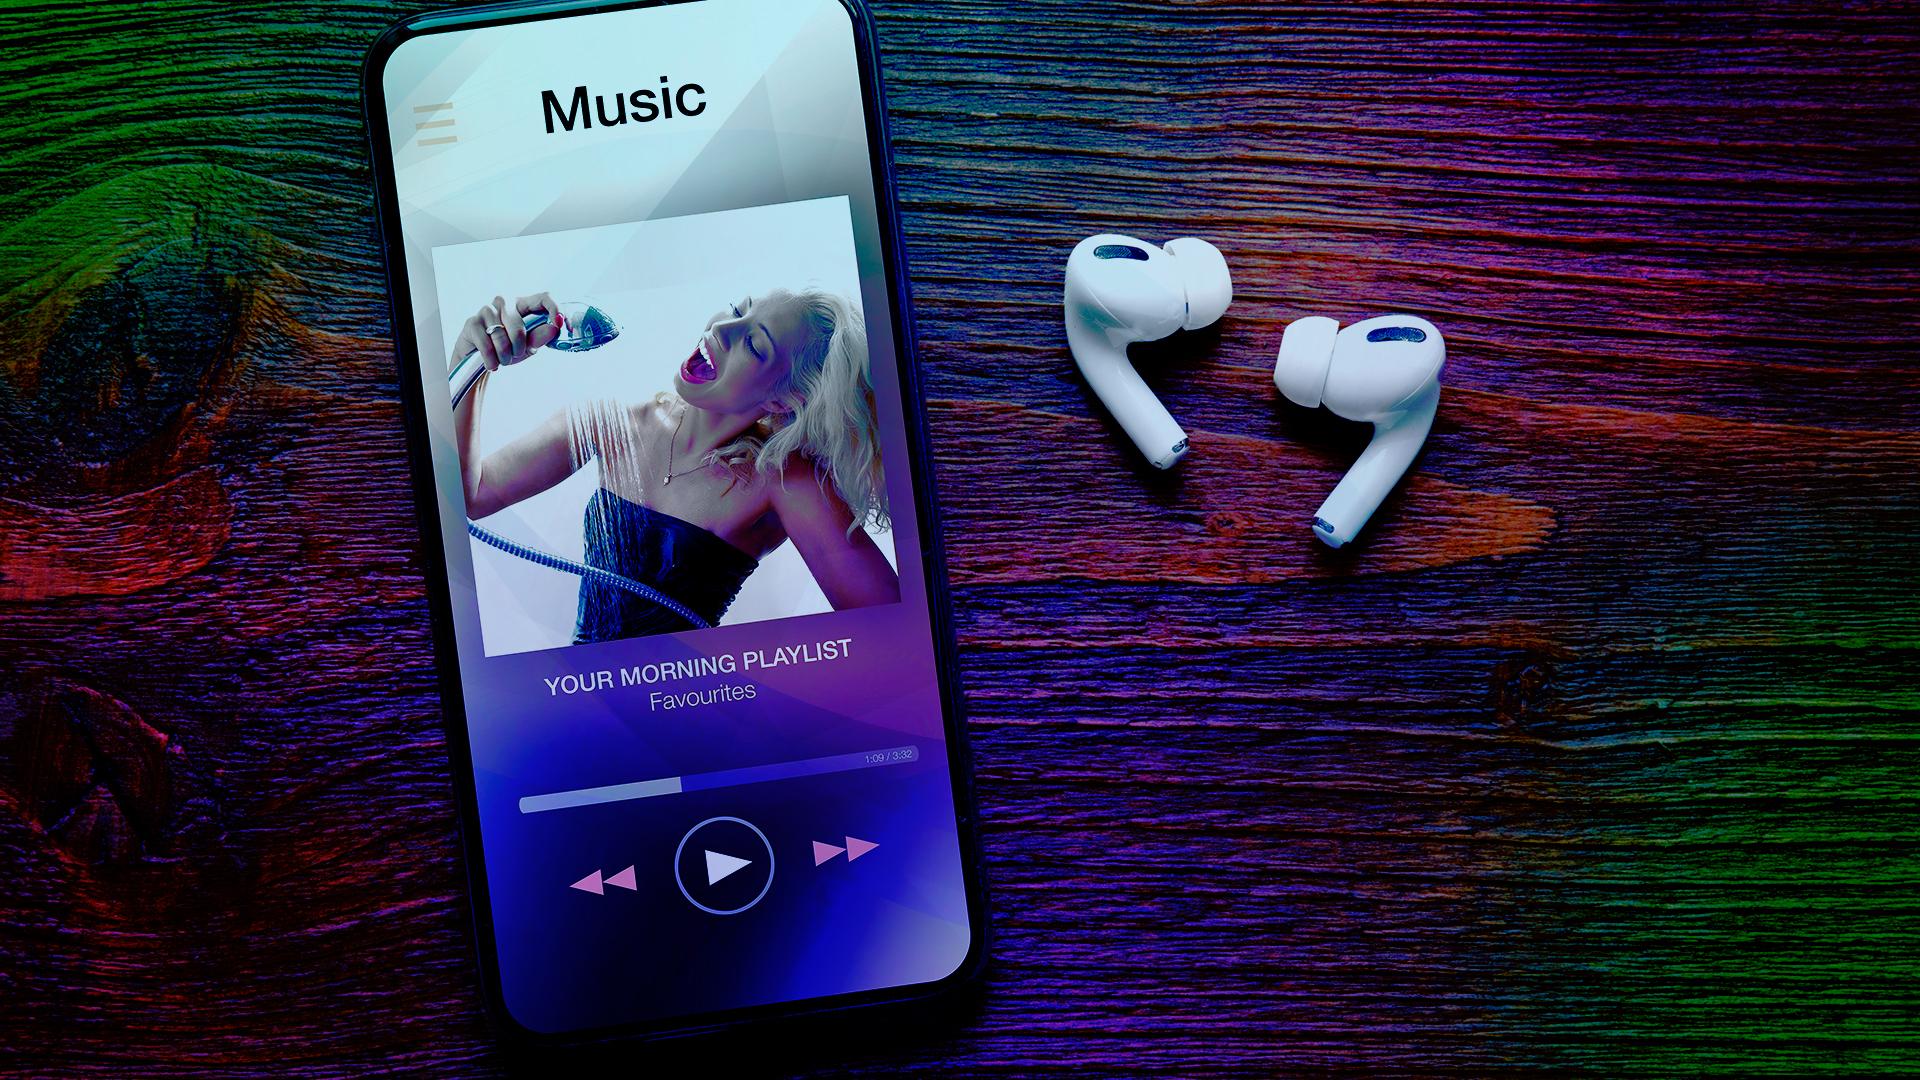 Smartphone, Streaming, Musik, Streamingportal, Kopfhörer, Audio, Headset, Musik-Streaming, musikstreaming, Player, Musikdienst, abspielen, AirPods, Play, Musik-Plattform, Audio Player, Musikflat, playlist, AirPods Pro, Song, Musik Streaming, Music Streaming